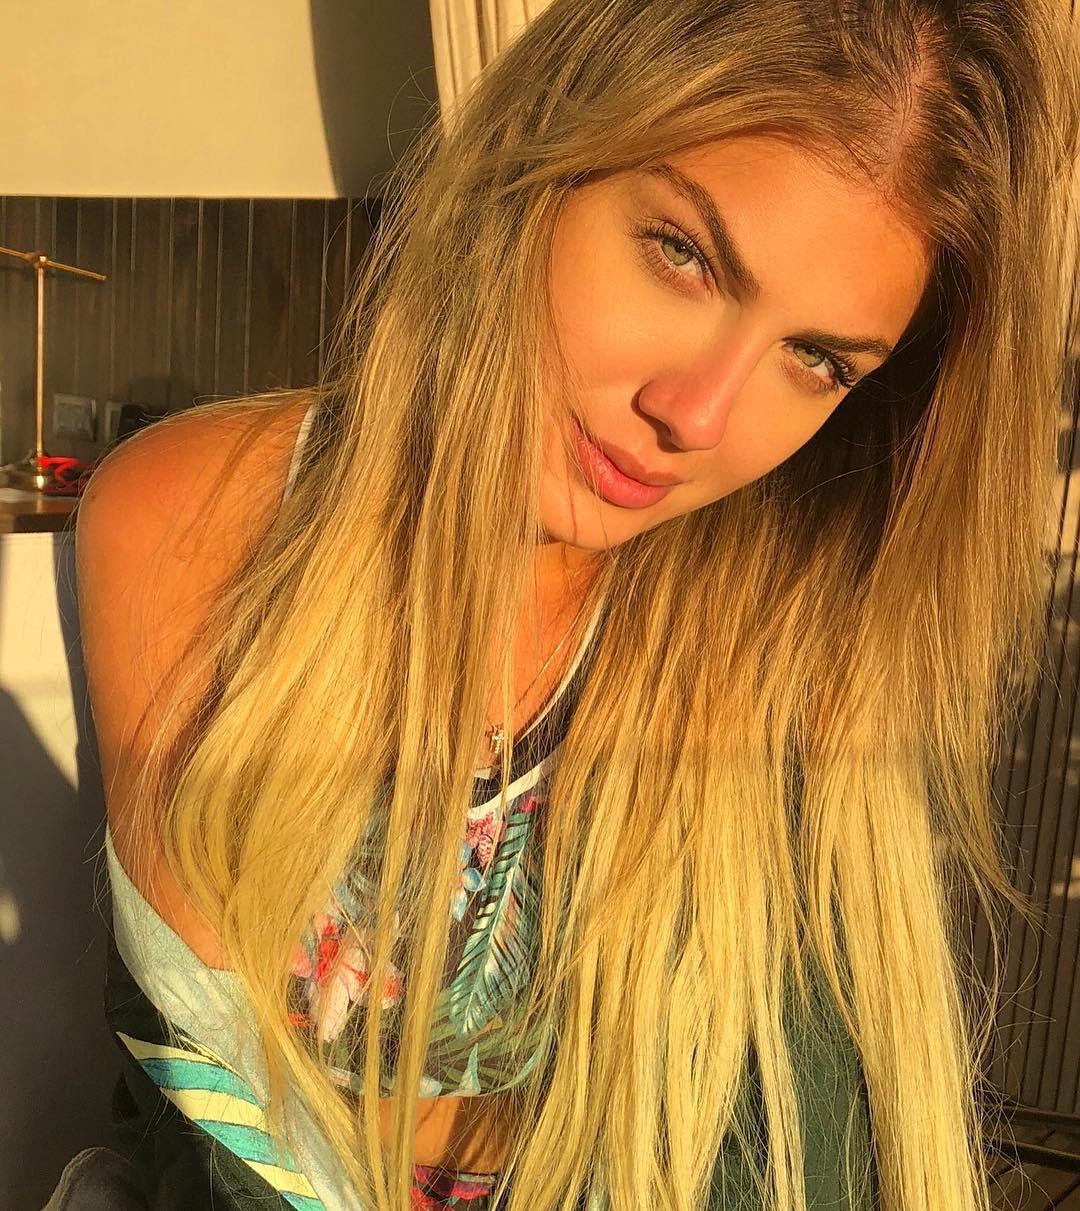 marcella portugal, miss andradina universo 2018. - Página 2 26305010